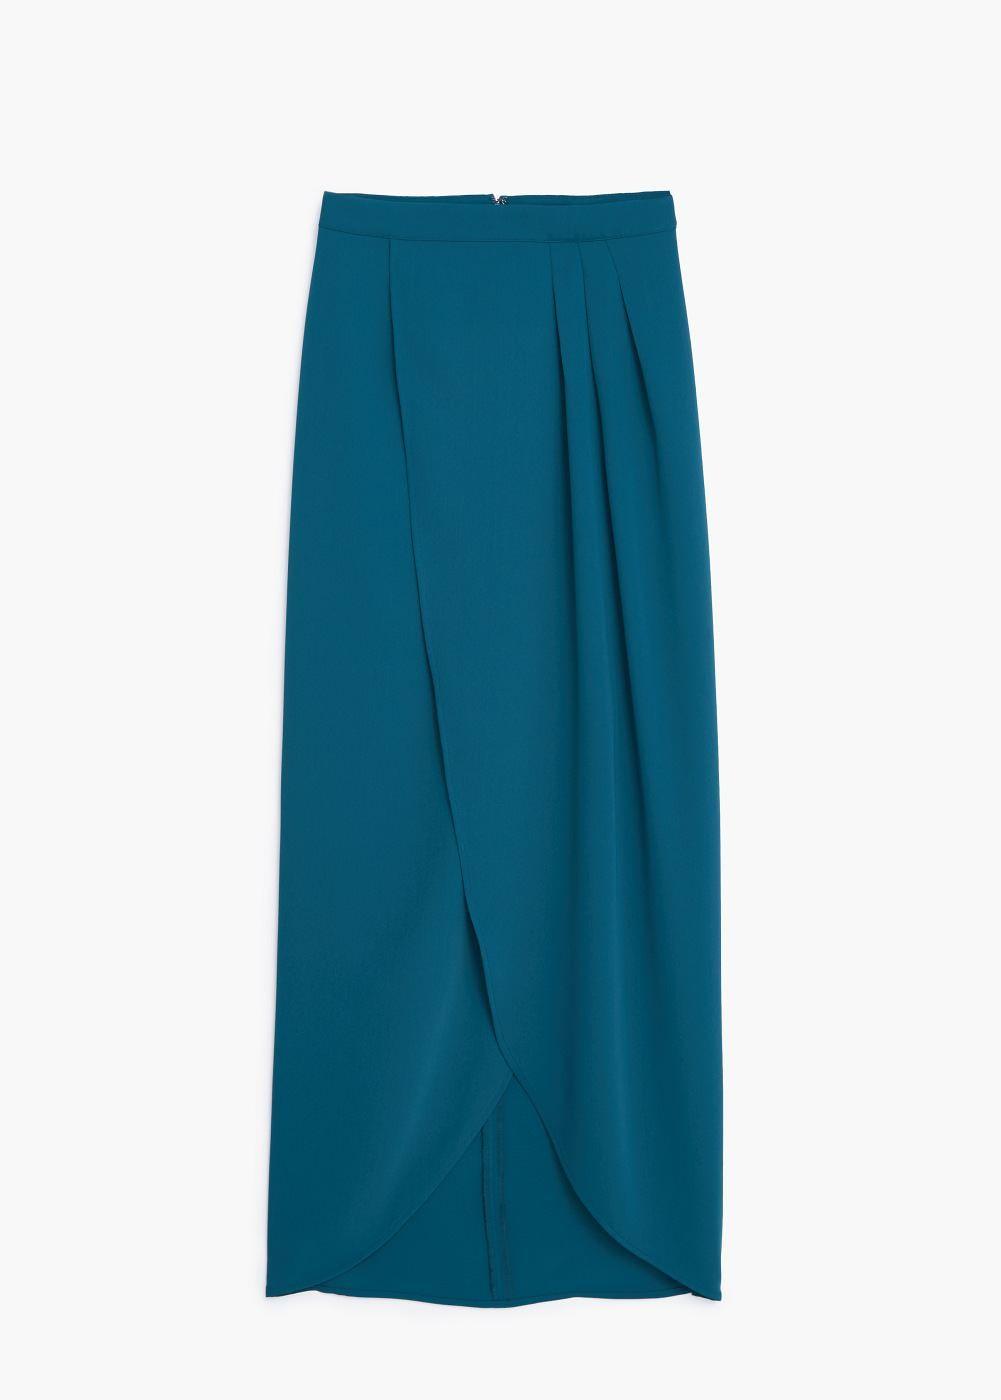 0d813e428 Falda larga cruzada - Mujer en 2019 | mis modas | Faldas largas ...